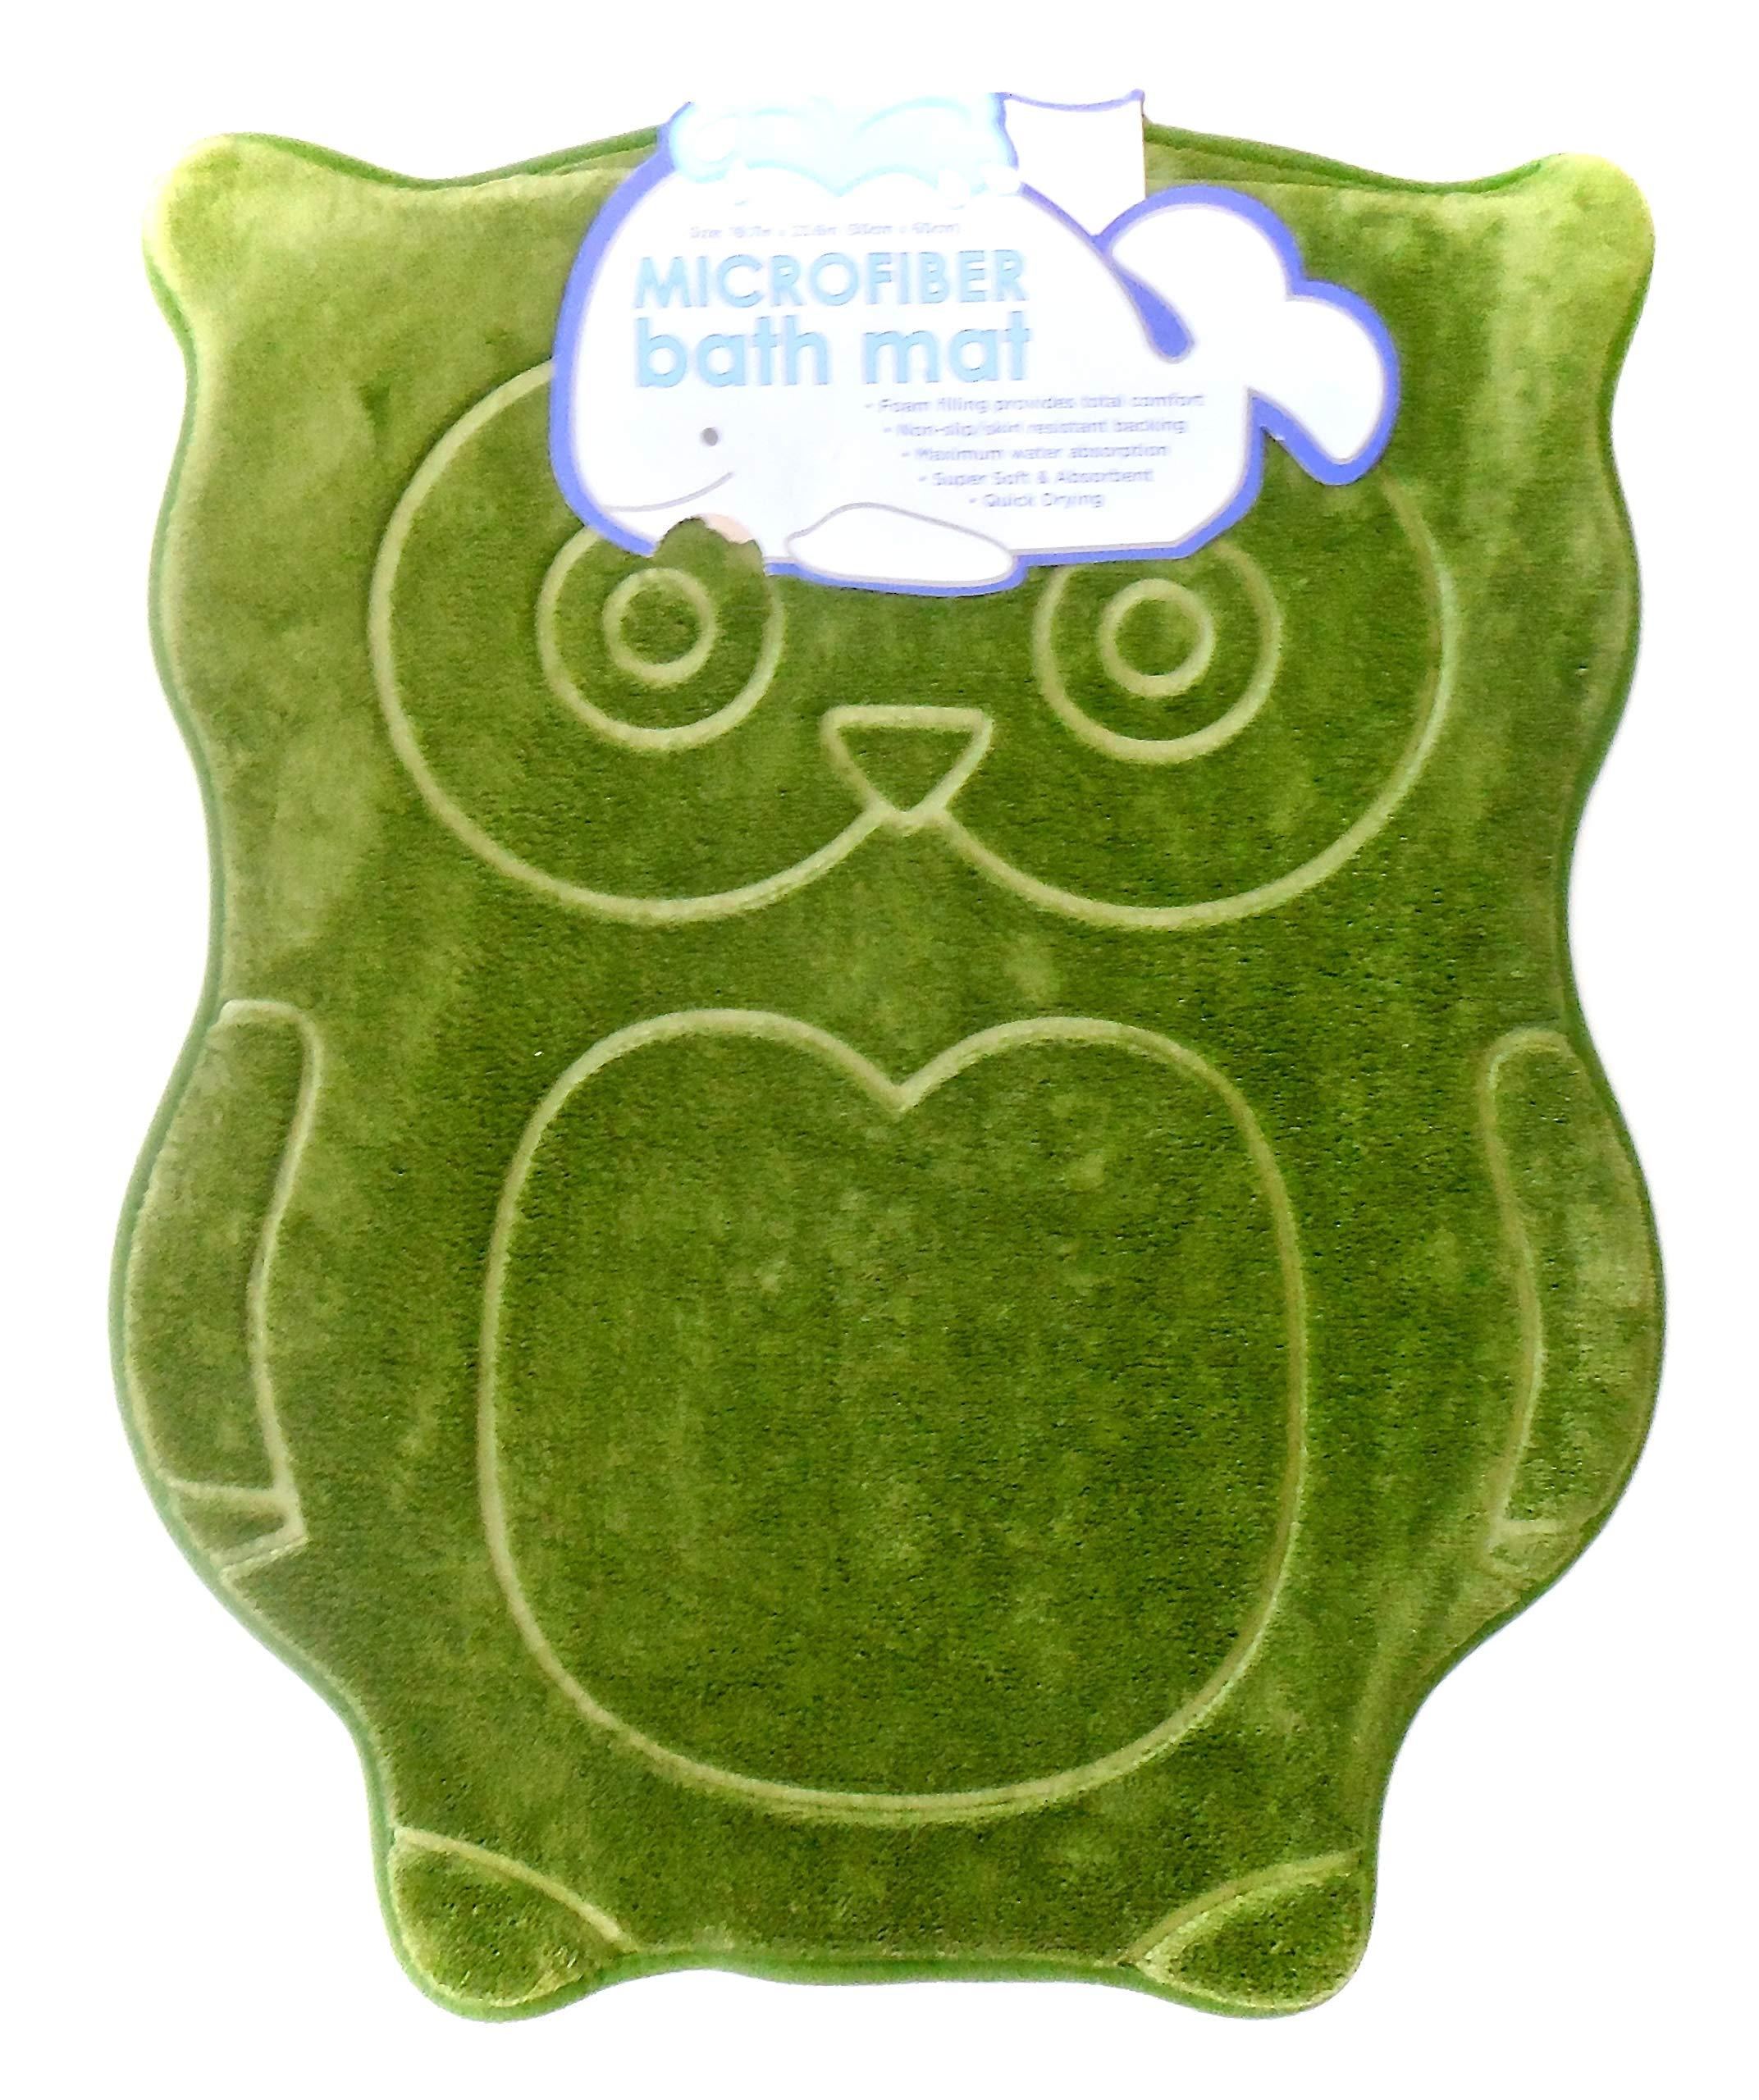 Owl Bath Mat,Microfiber,Non-Slip Backing,19.7'' x 23.6'' (Green Owl)